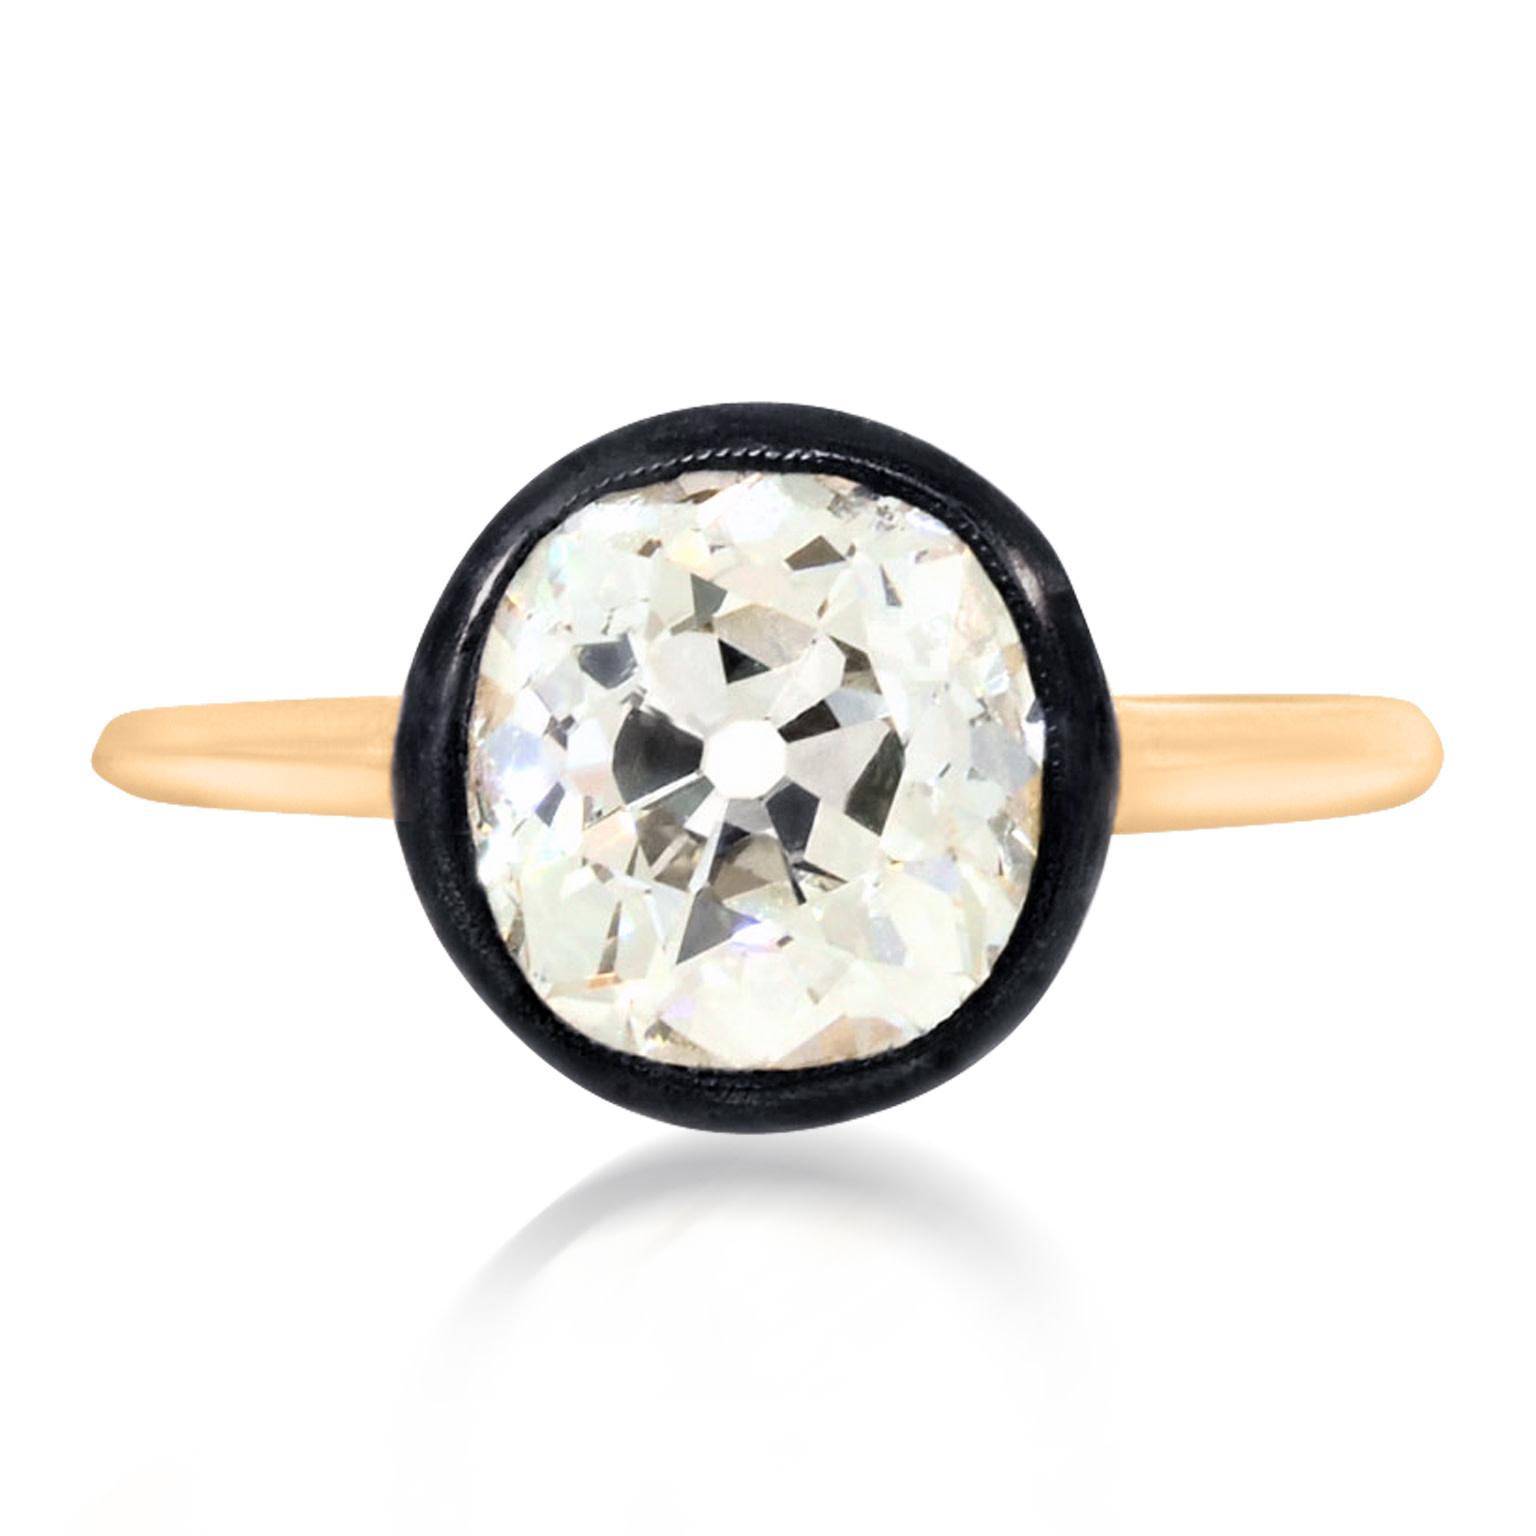 Trabert Goldsmiths 2.65ct Old Mine Cut Diamond Georgian Ring